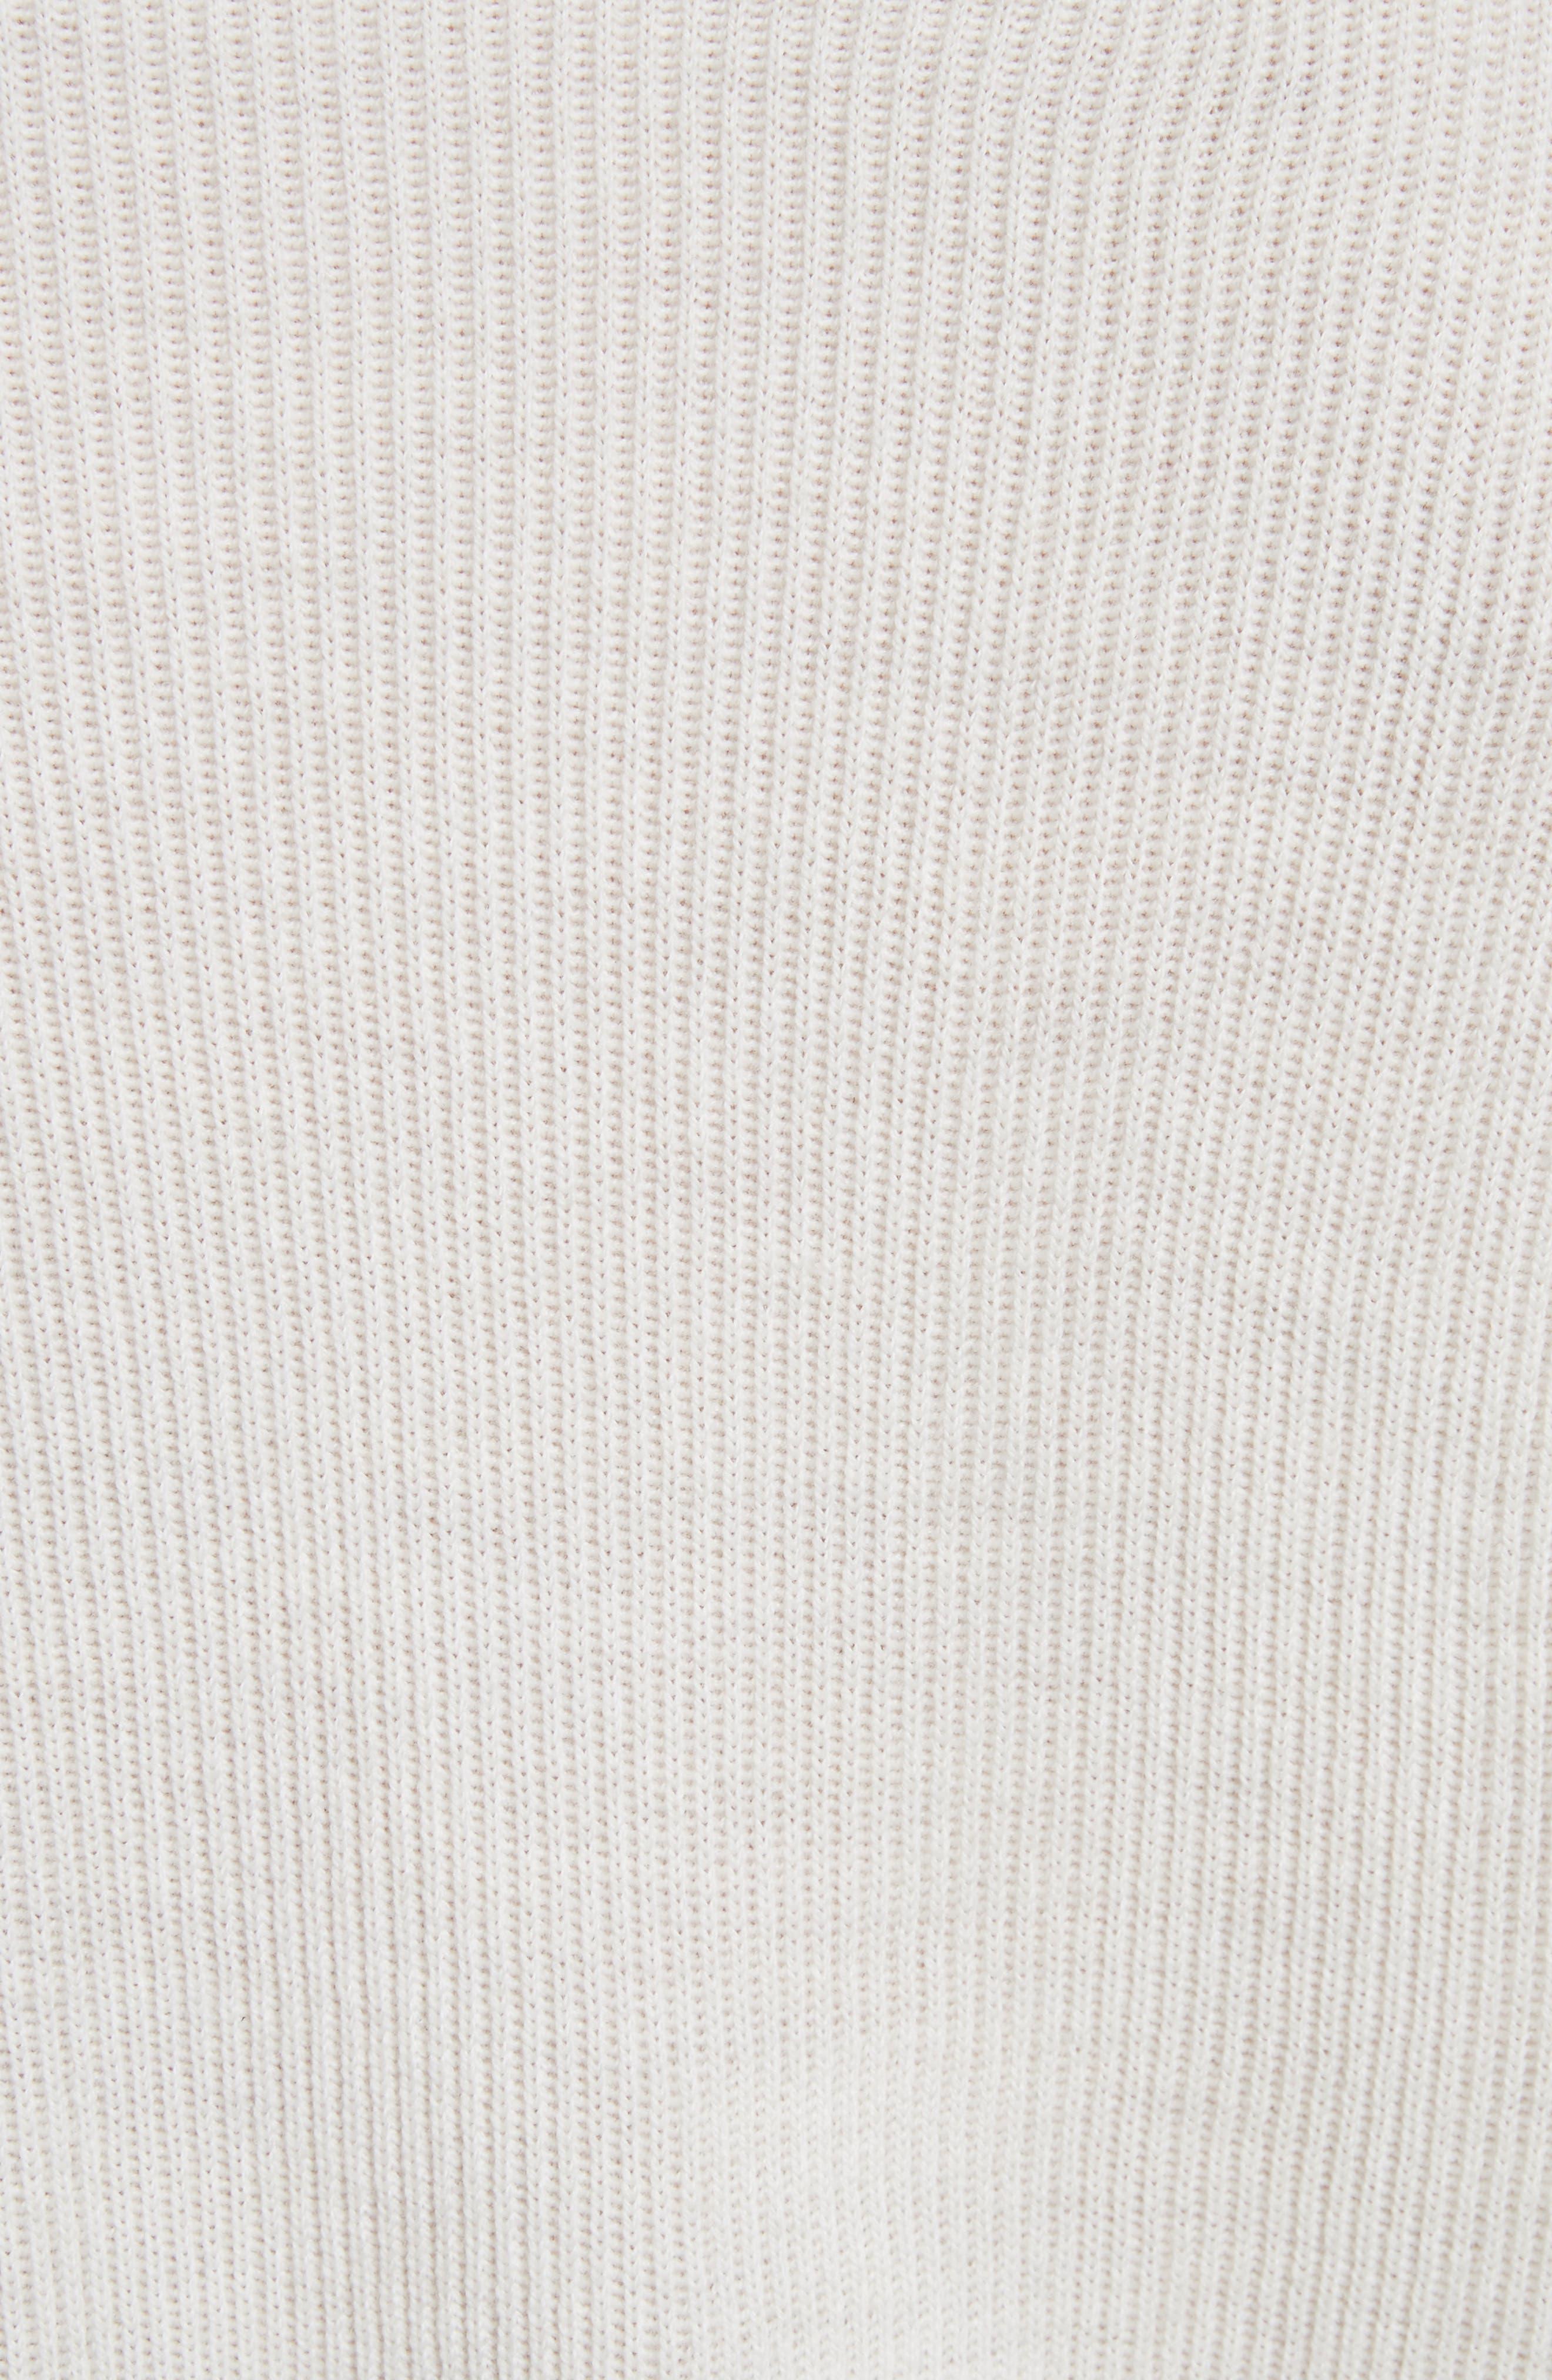 T by Alexander Wang Snap Detail Merino Wool Blend Sweater,                             Alternate thumbnail 5, color,                             906